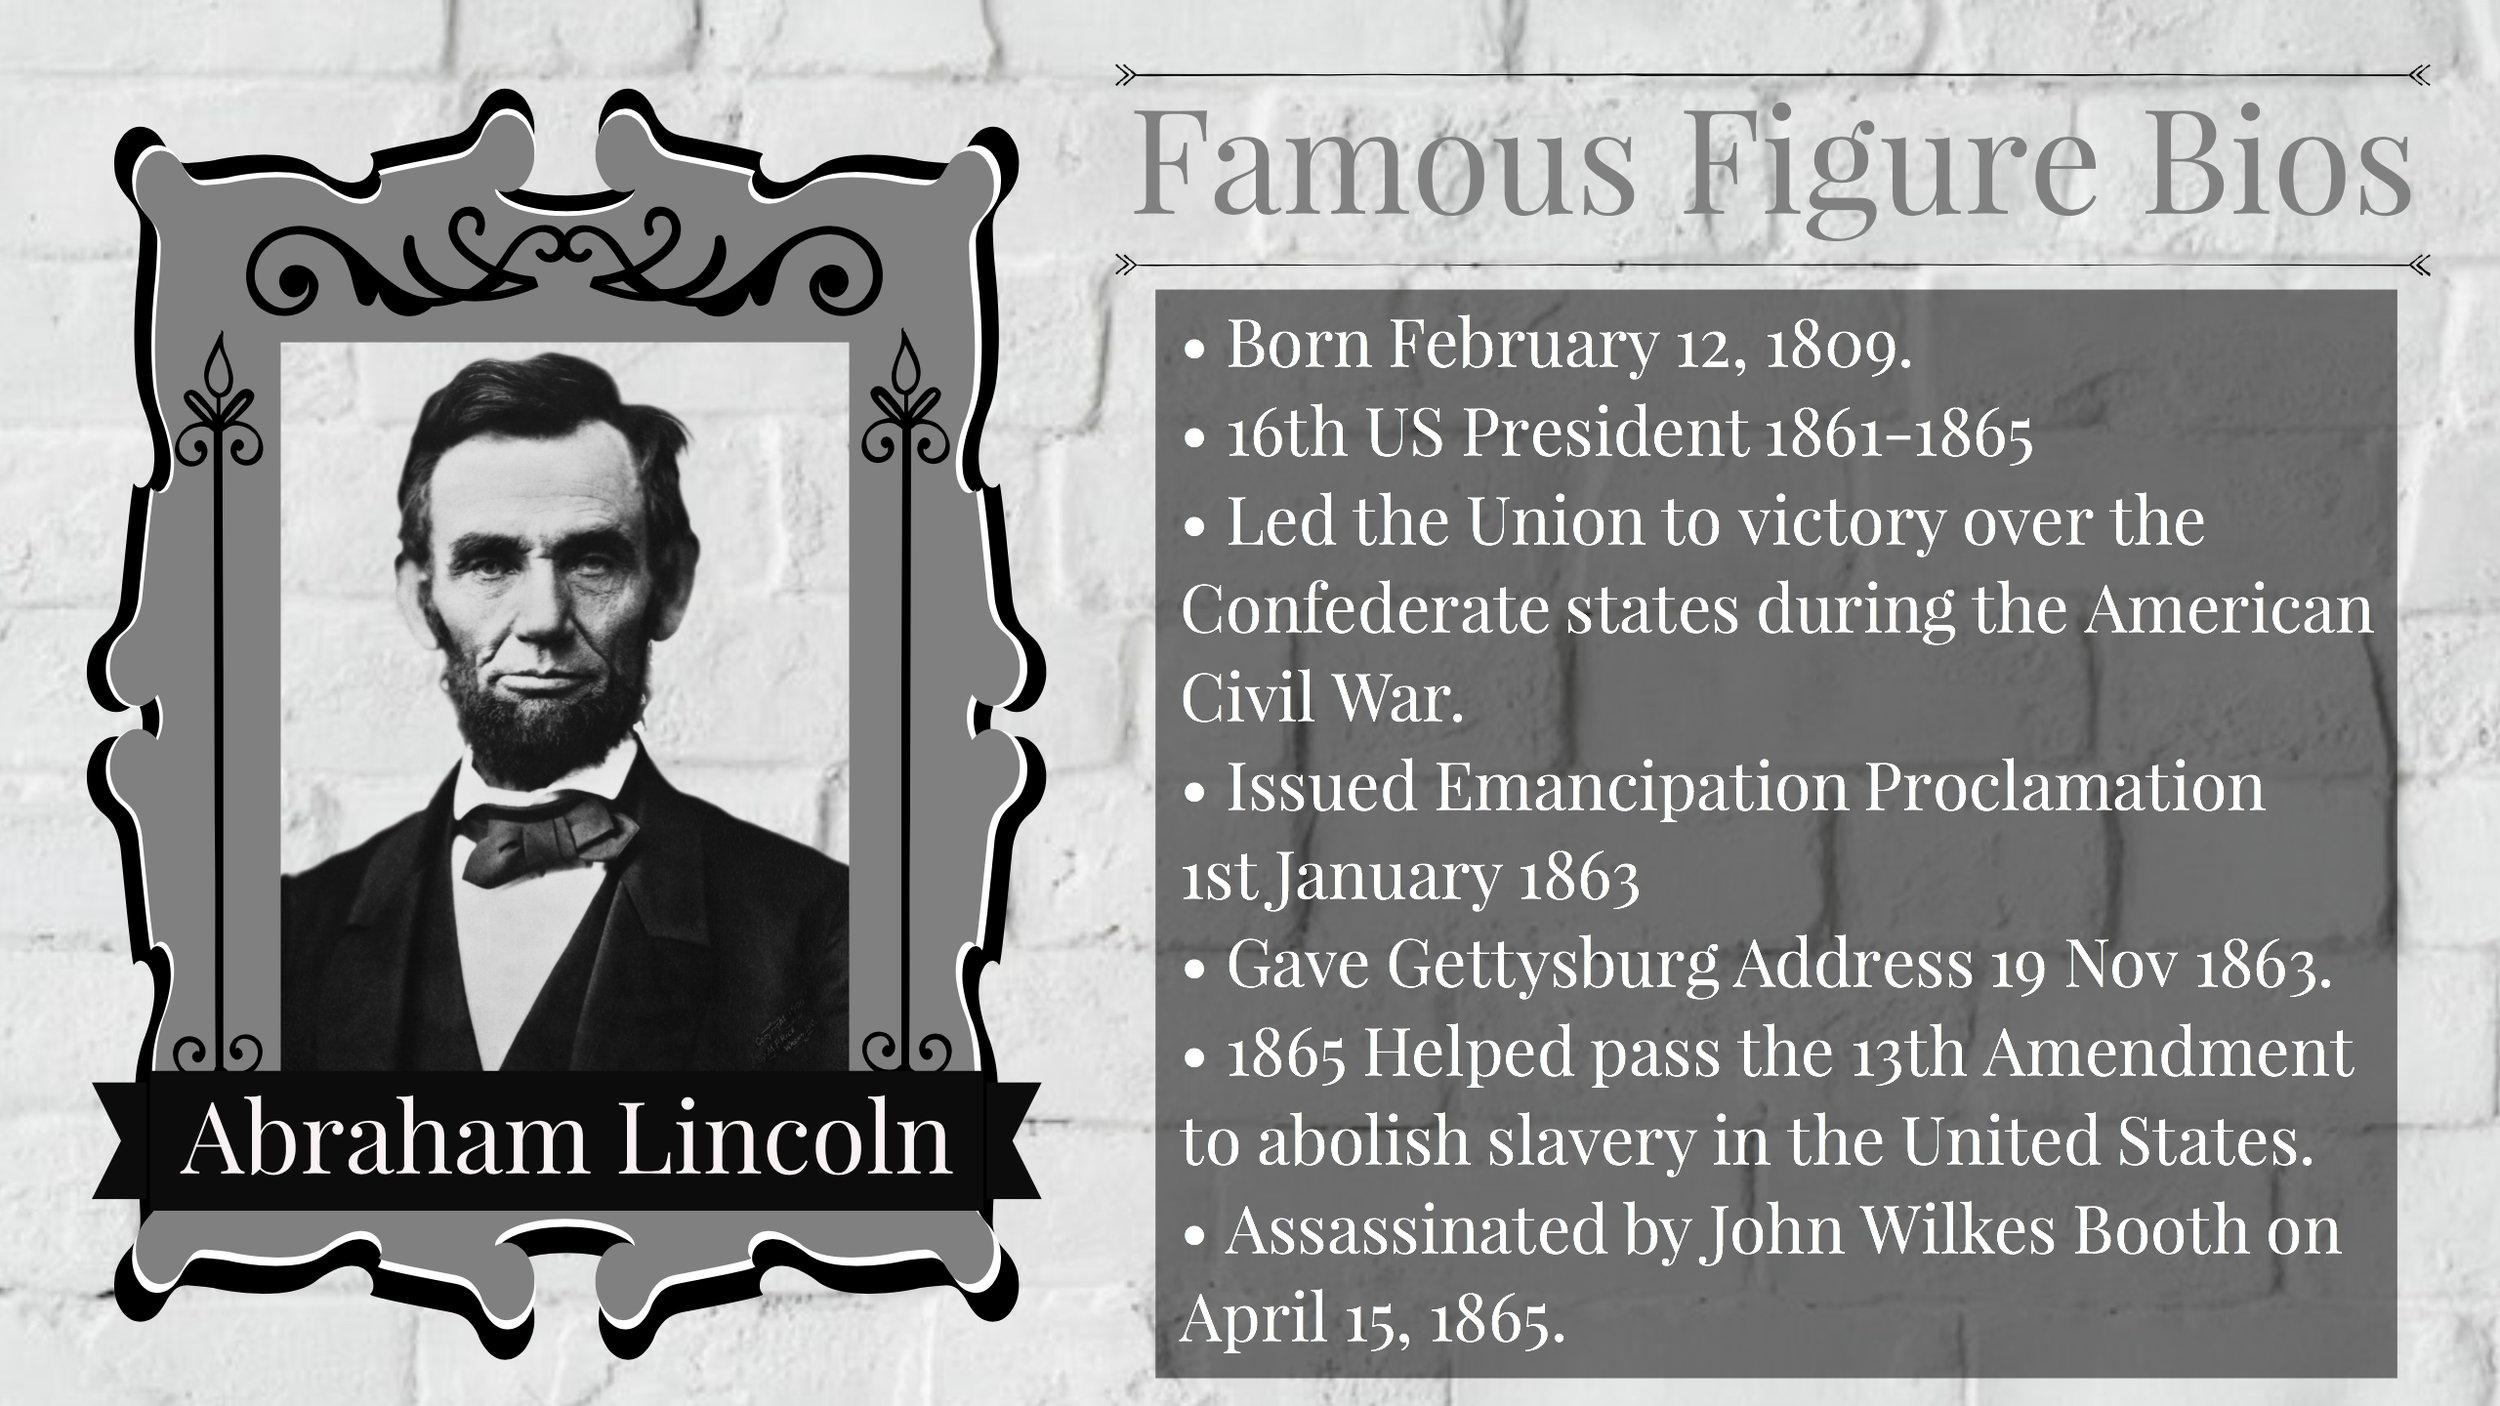 famous figure bio